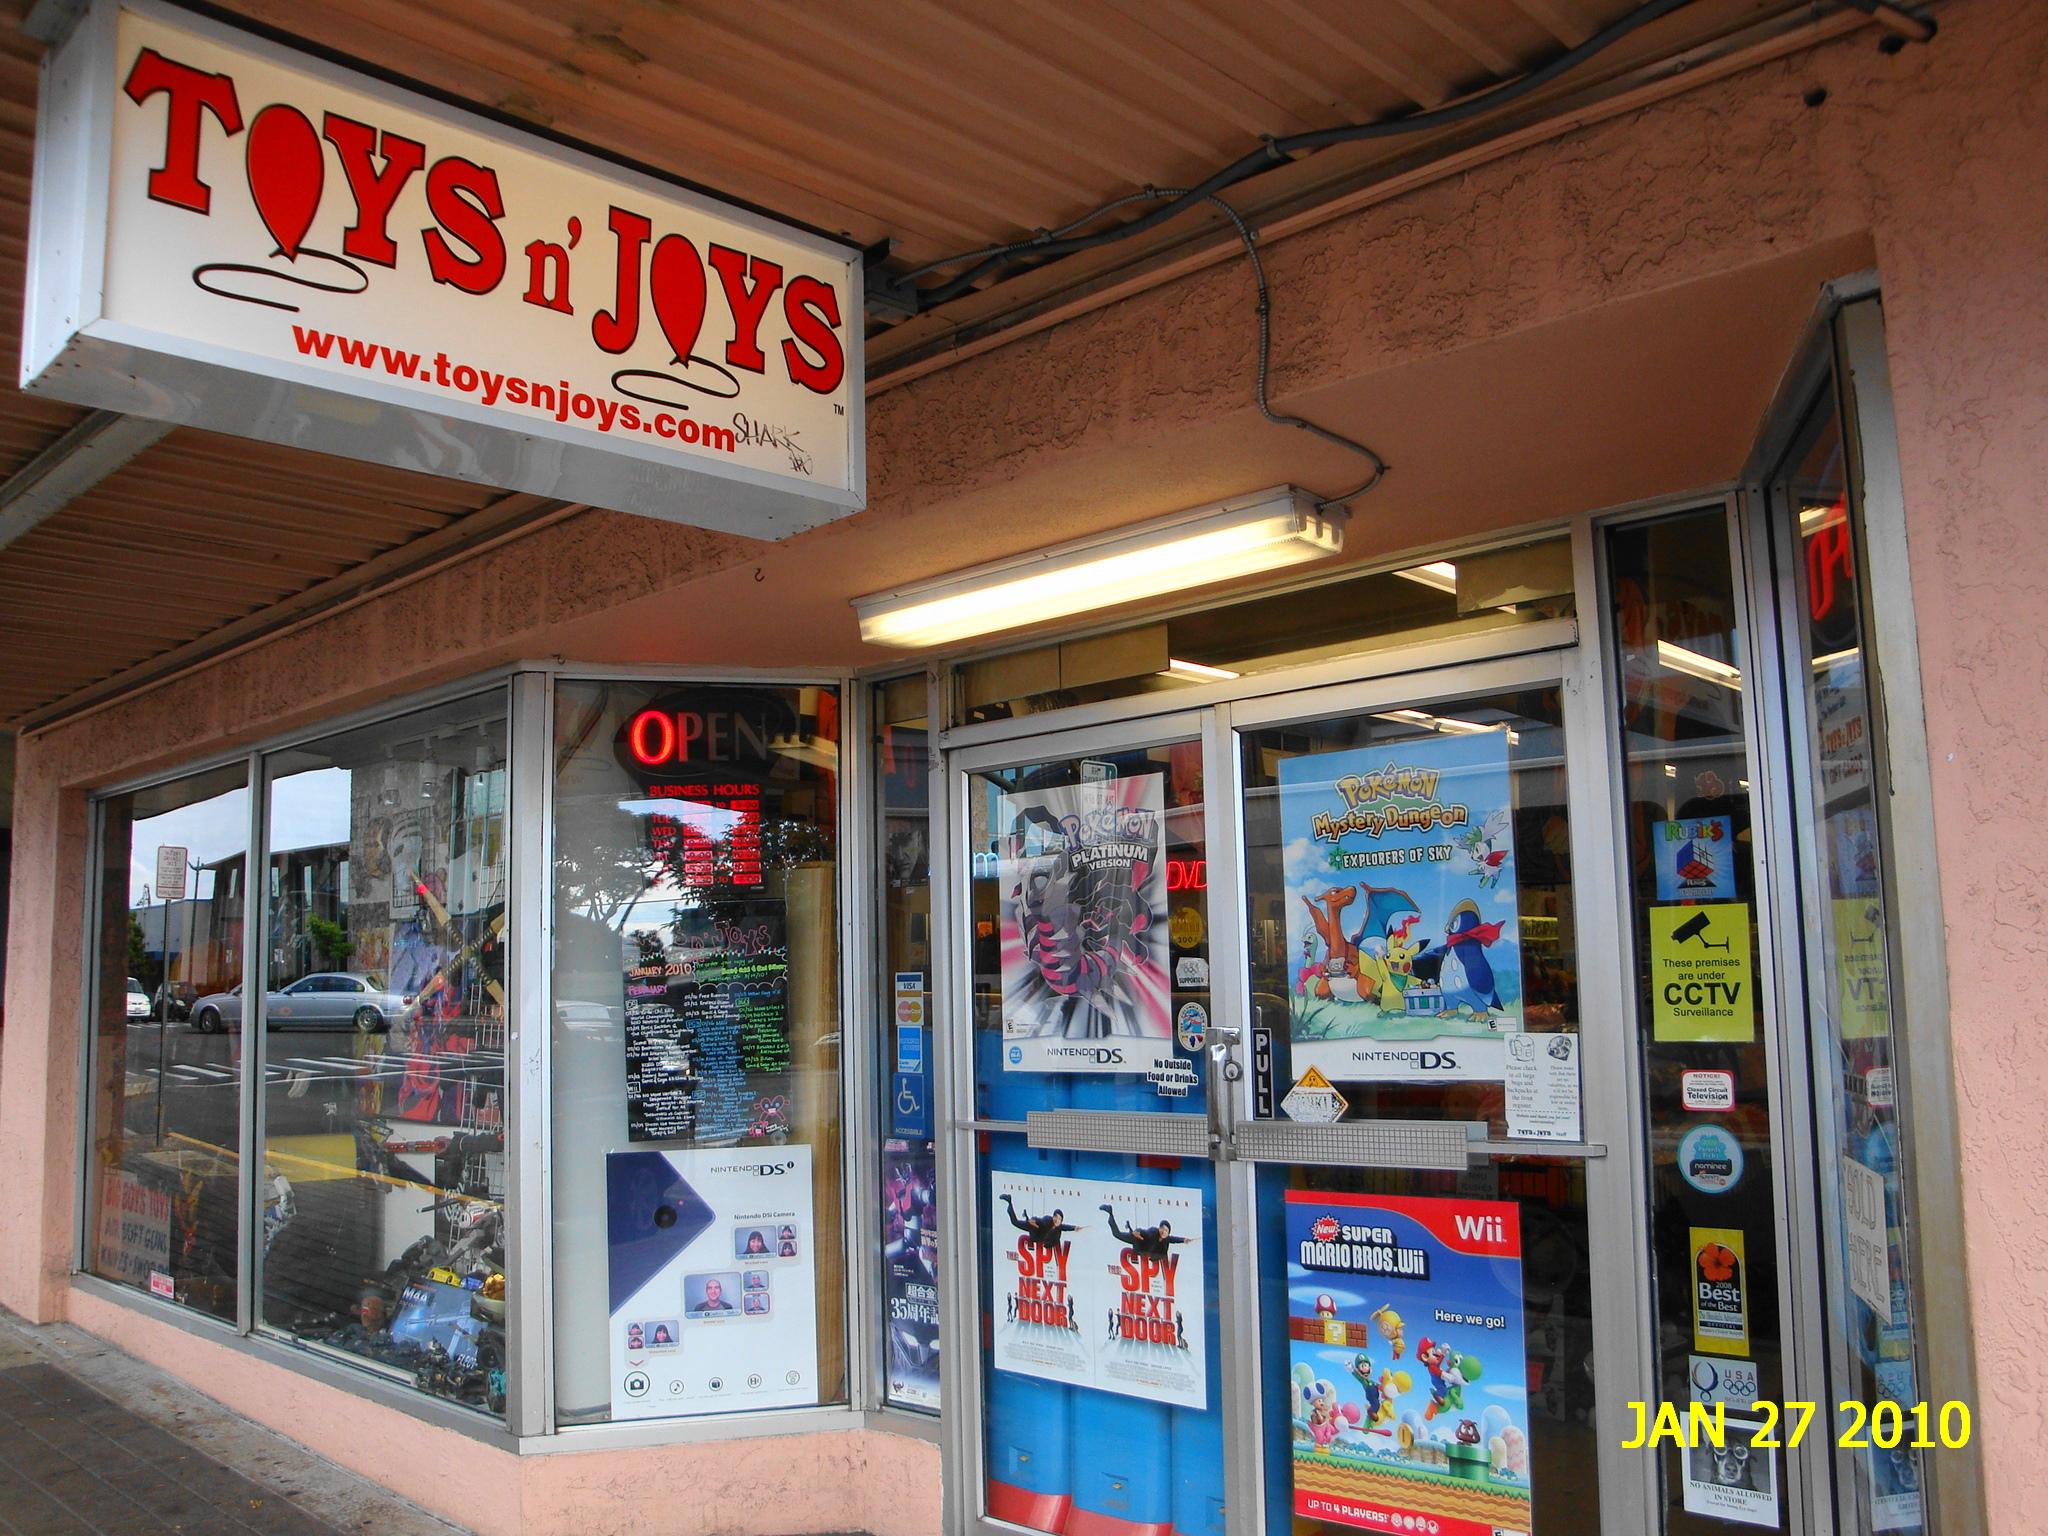 Toys N Joys : 音楽生活 <ハワイ> toys n joys ジャパニーズトイショップ・トイズンジョイズ